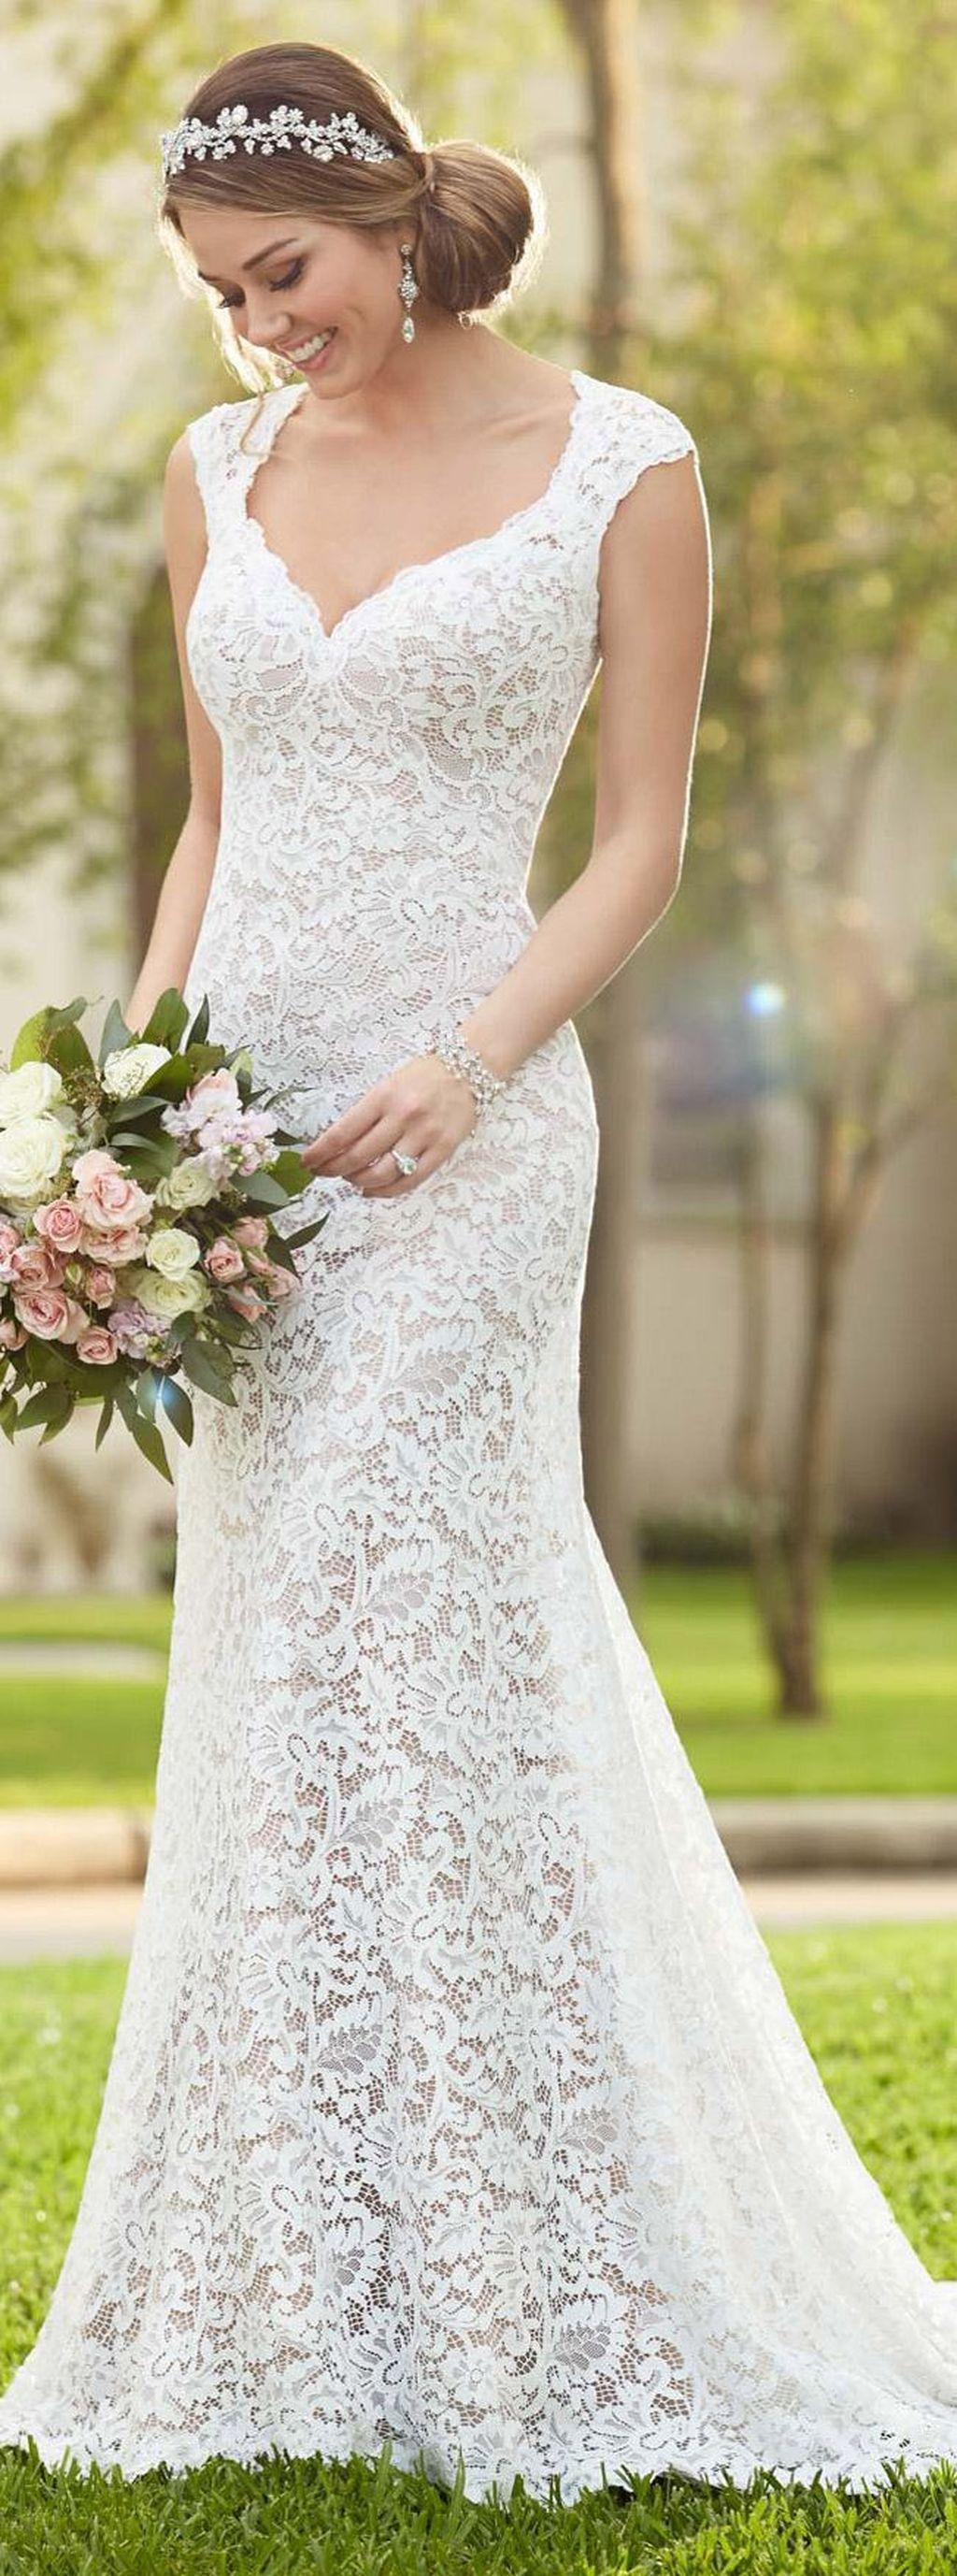 Alia bastamam wedding dress   Beautiful Princess Mermaid Wedding Dress Ideas  Mermaid wedding